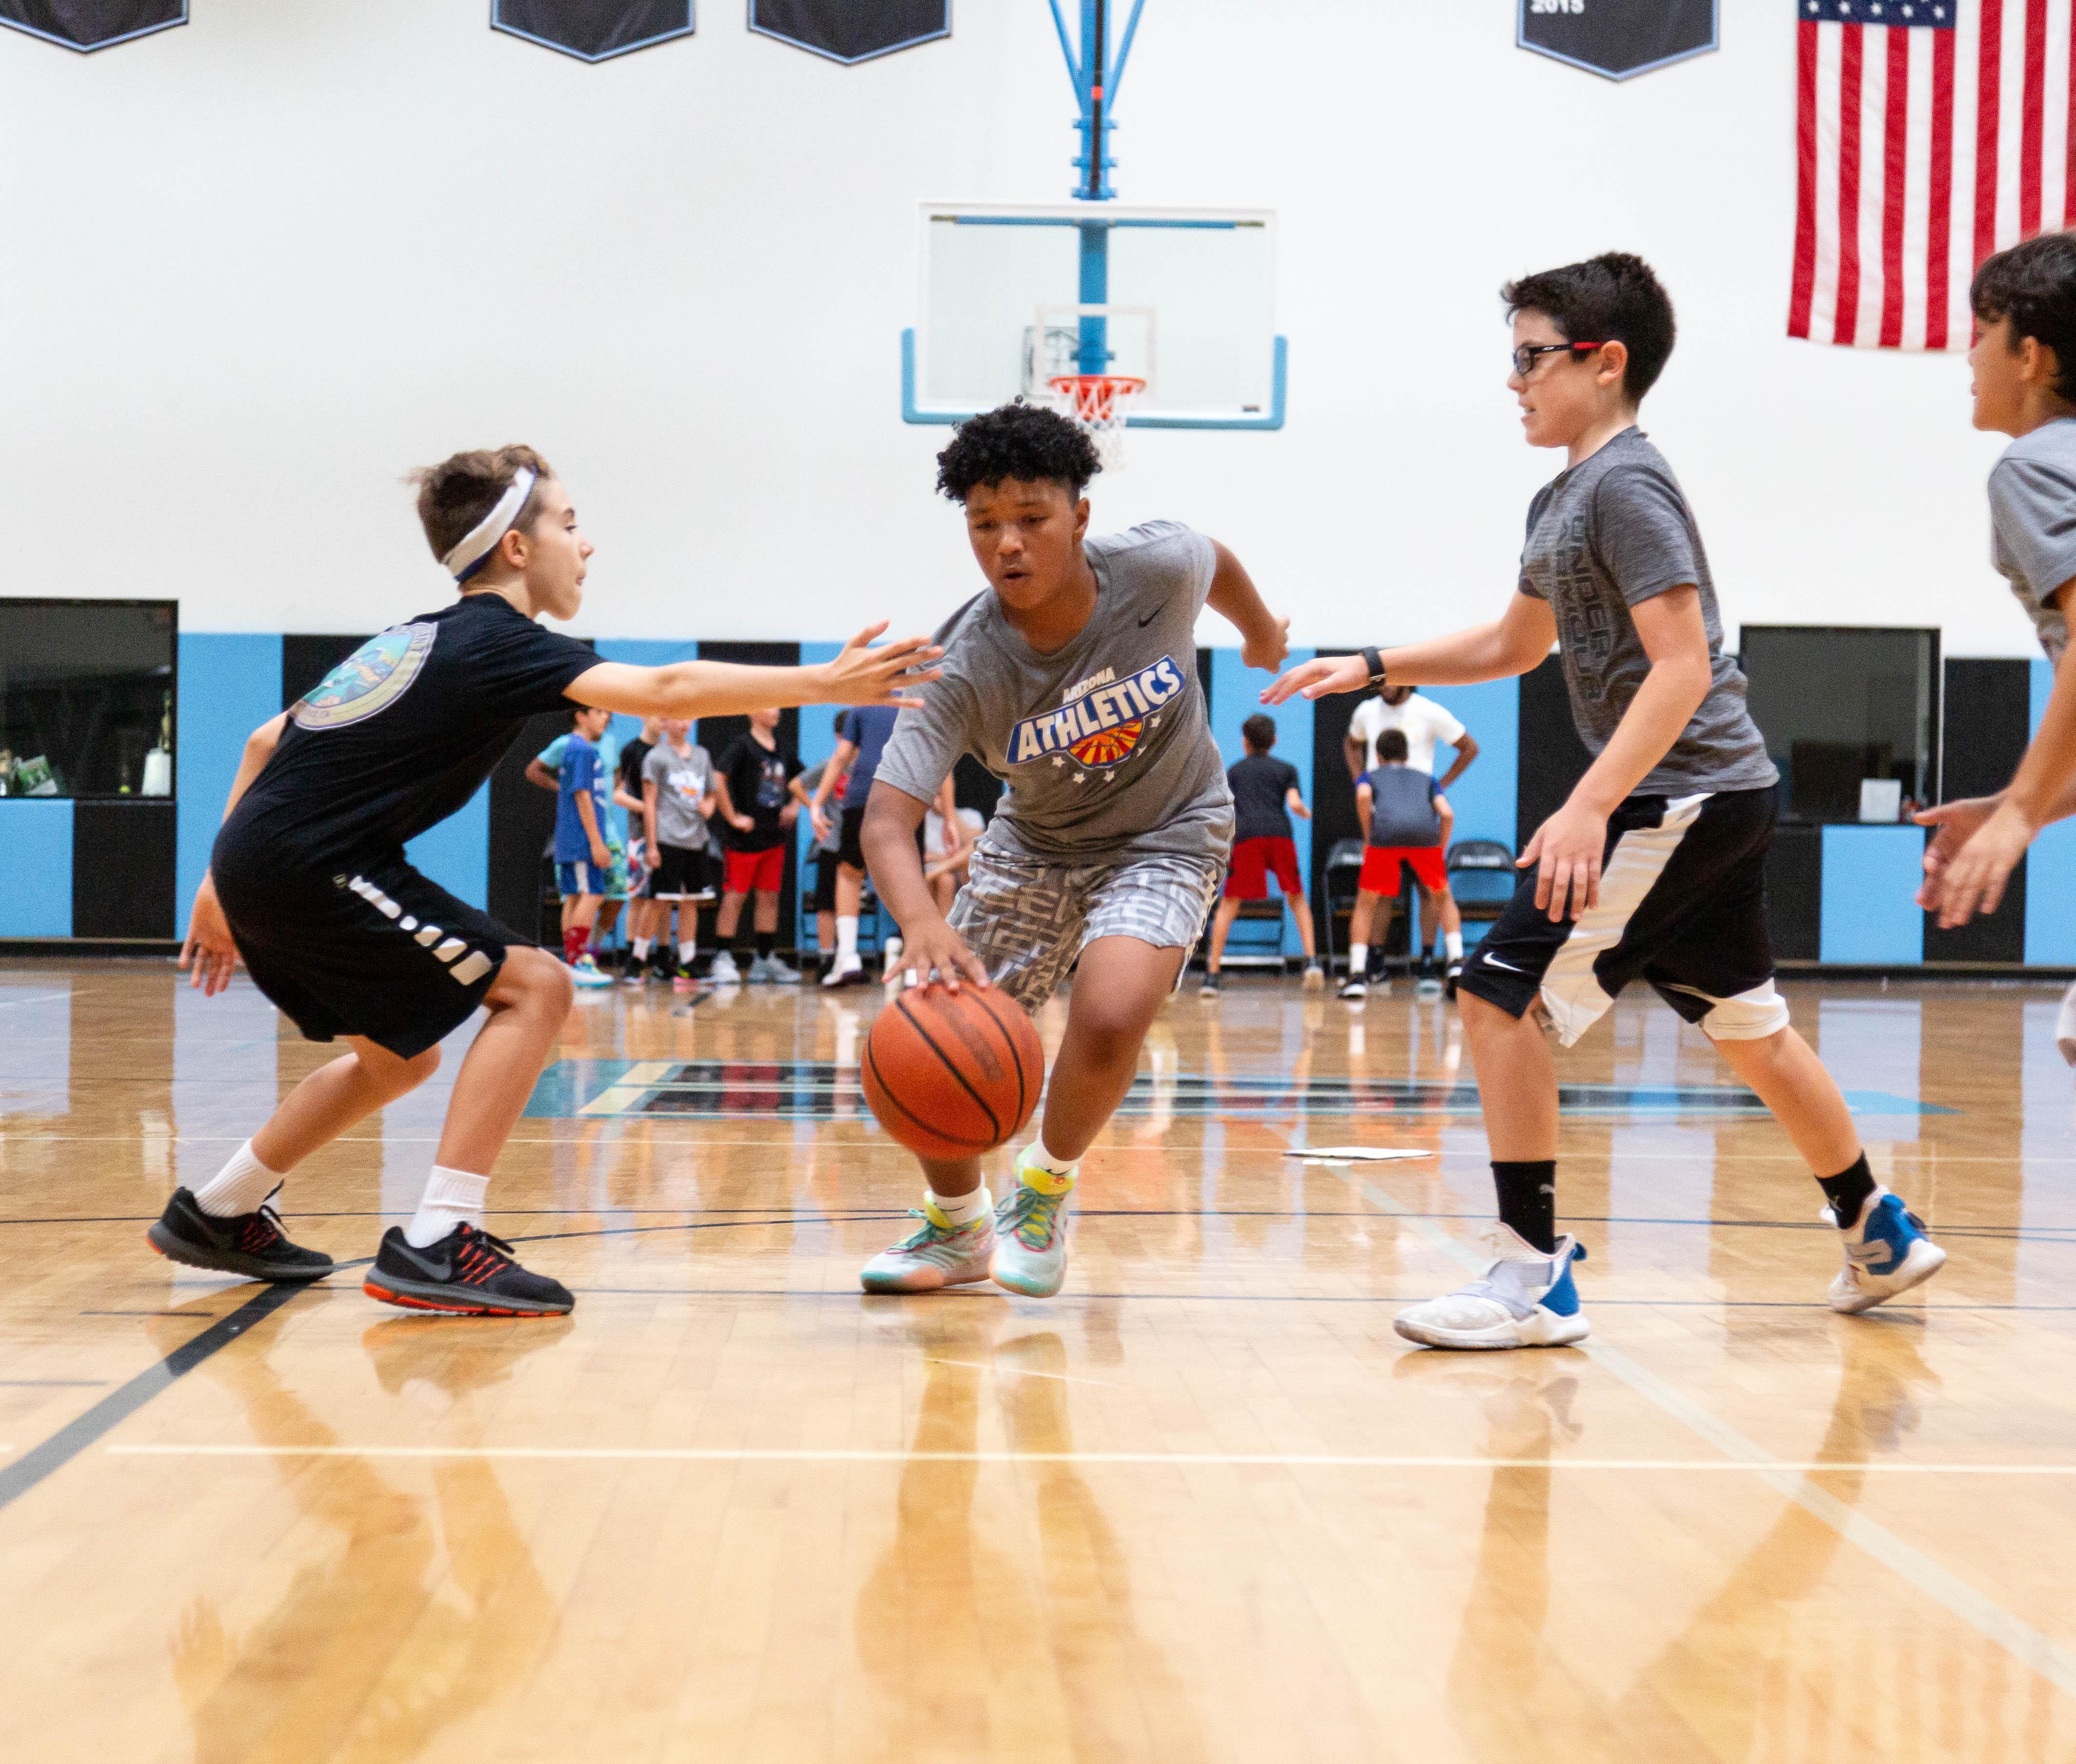 Basketball Skills Training K - HS options